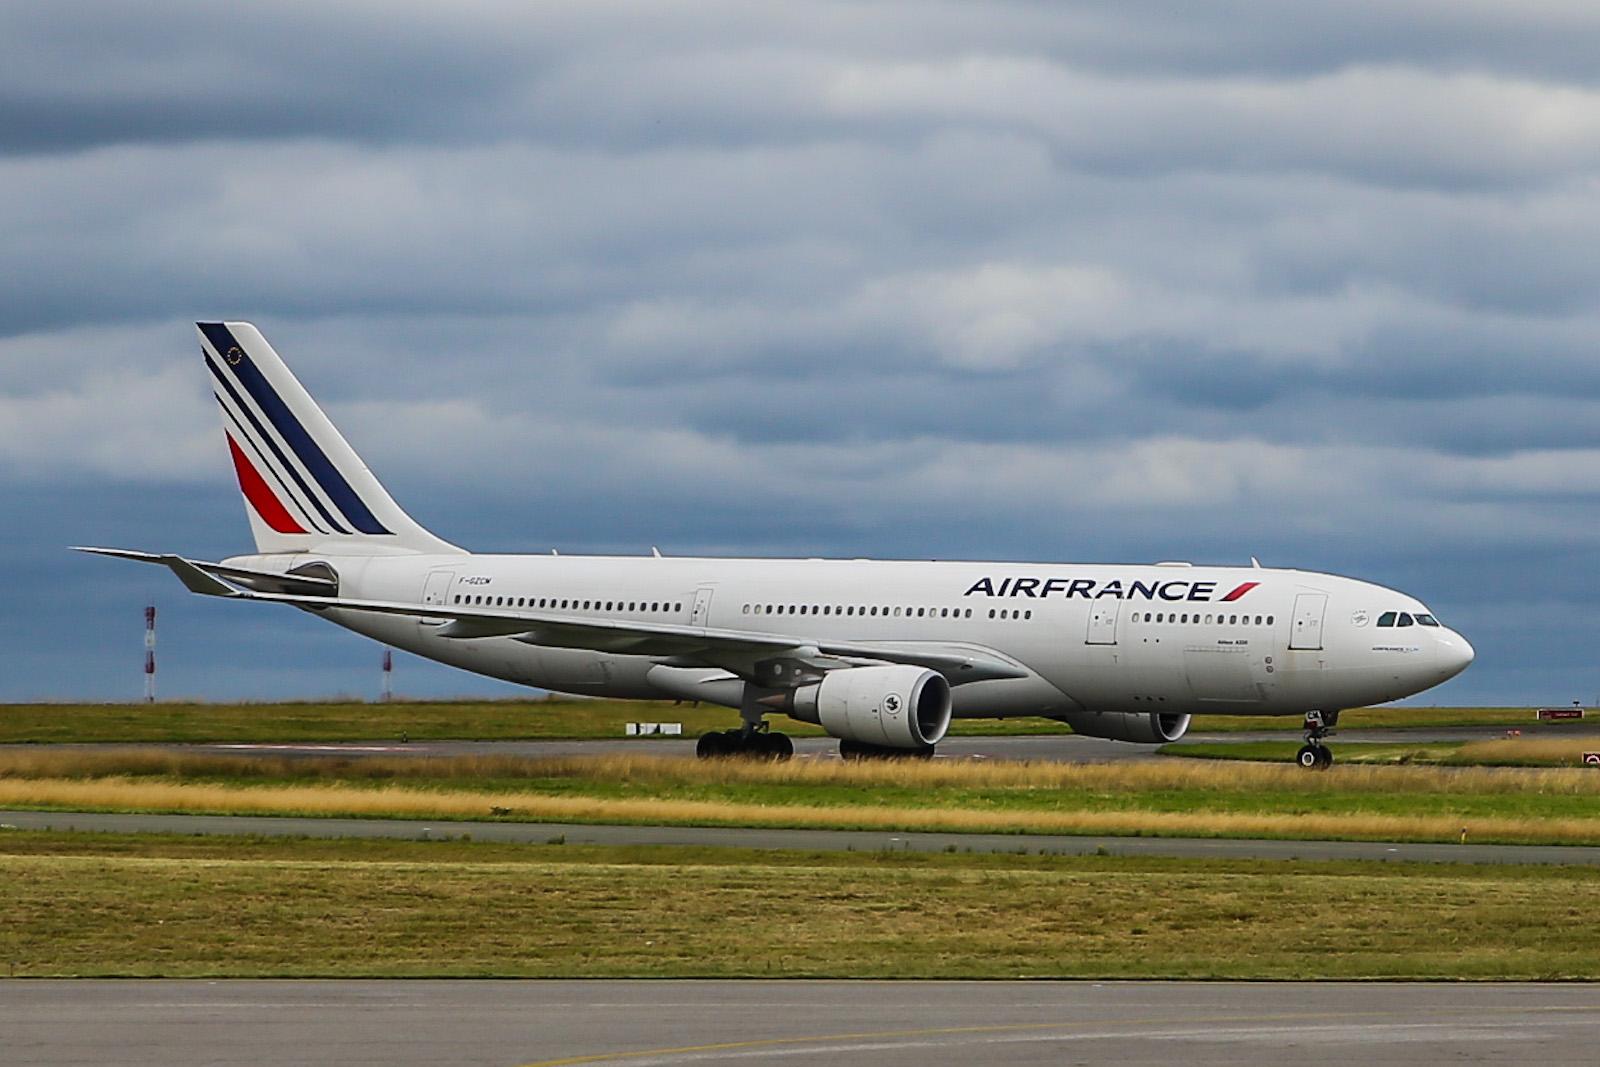 Airbus A330-200 авиакомпании Air France в аэропорту Париж Шарль-де-Голль